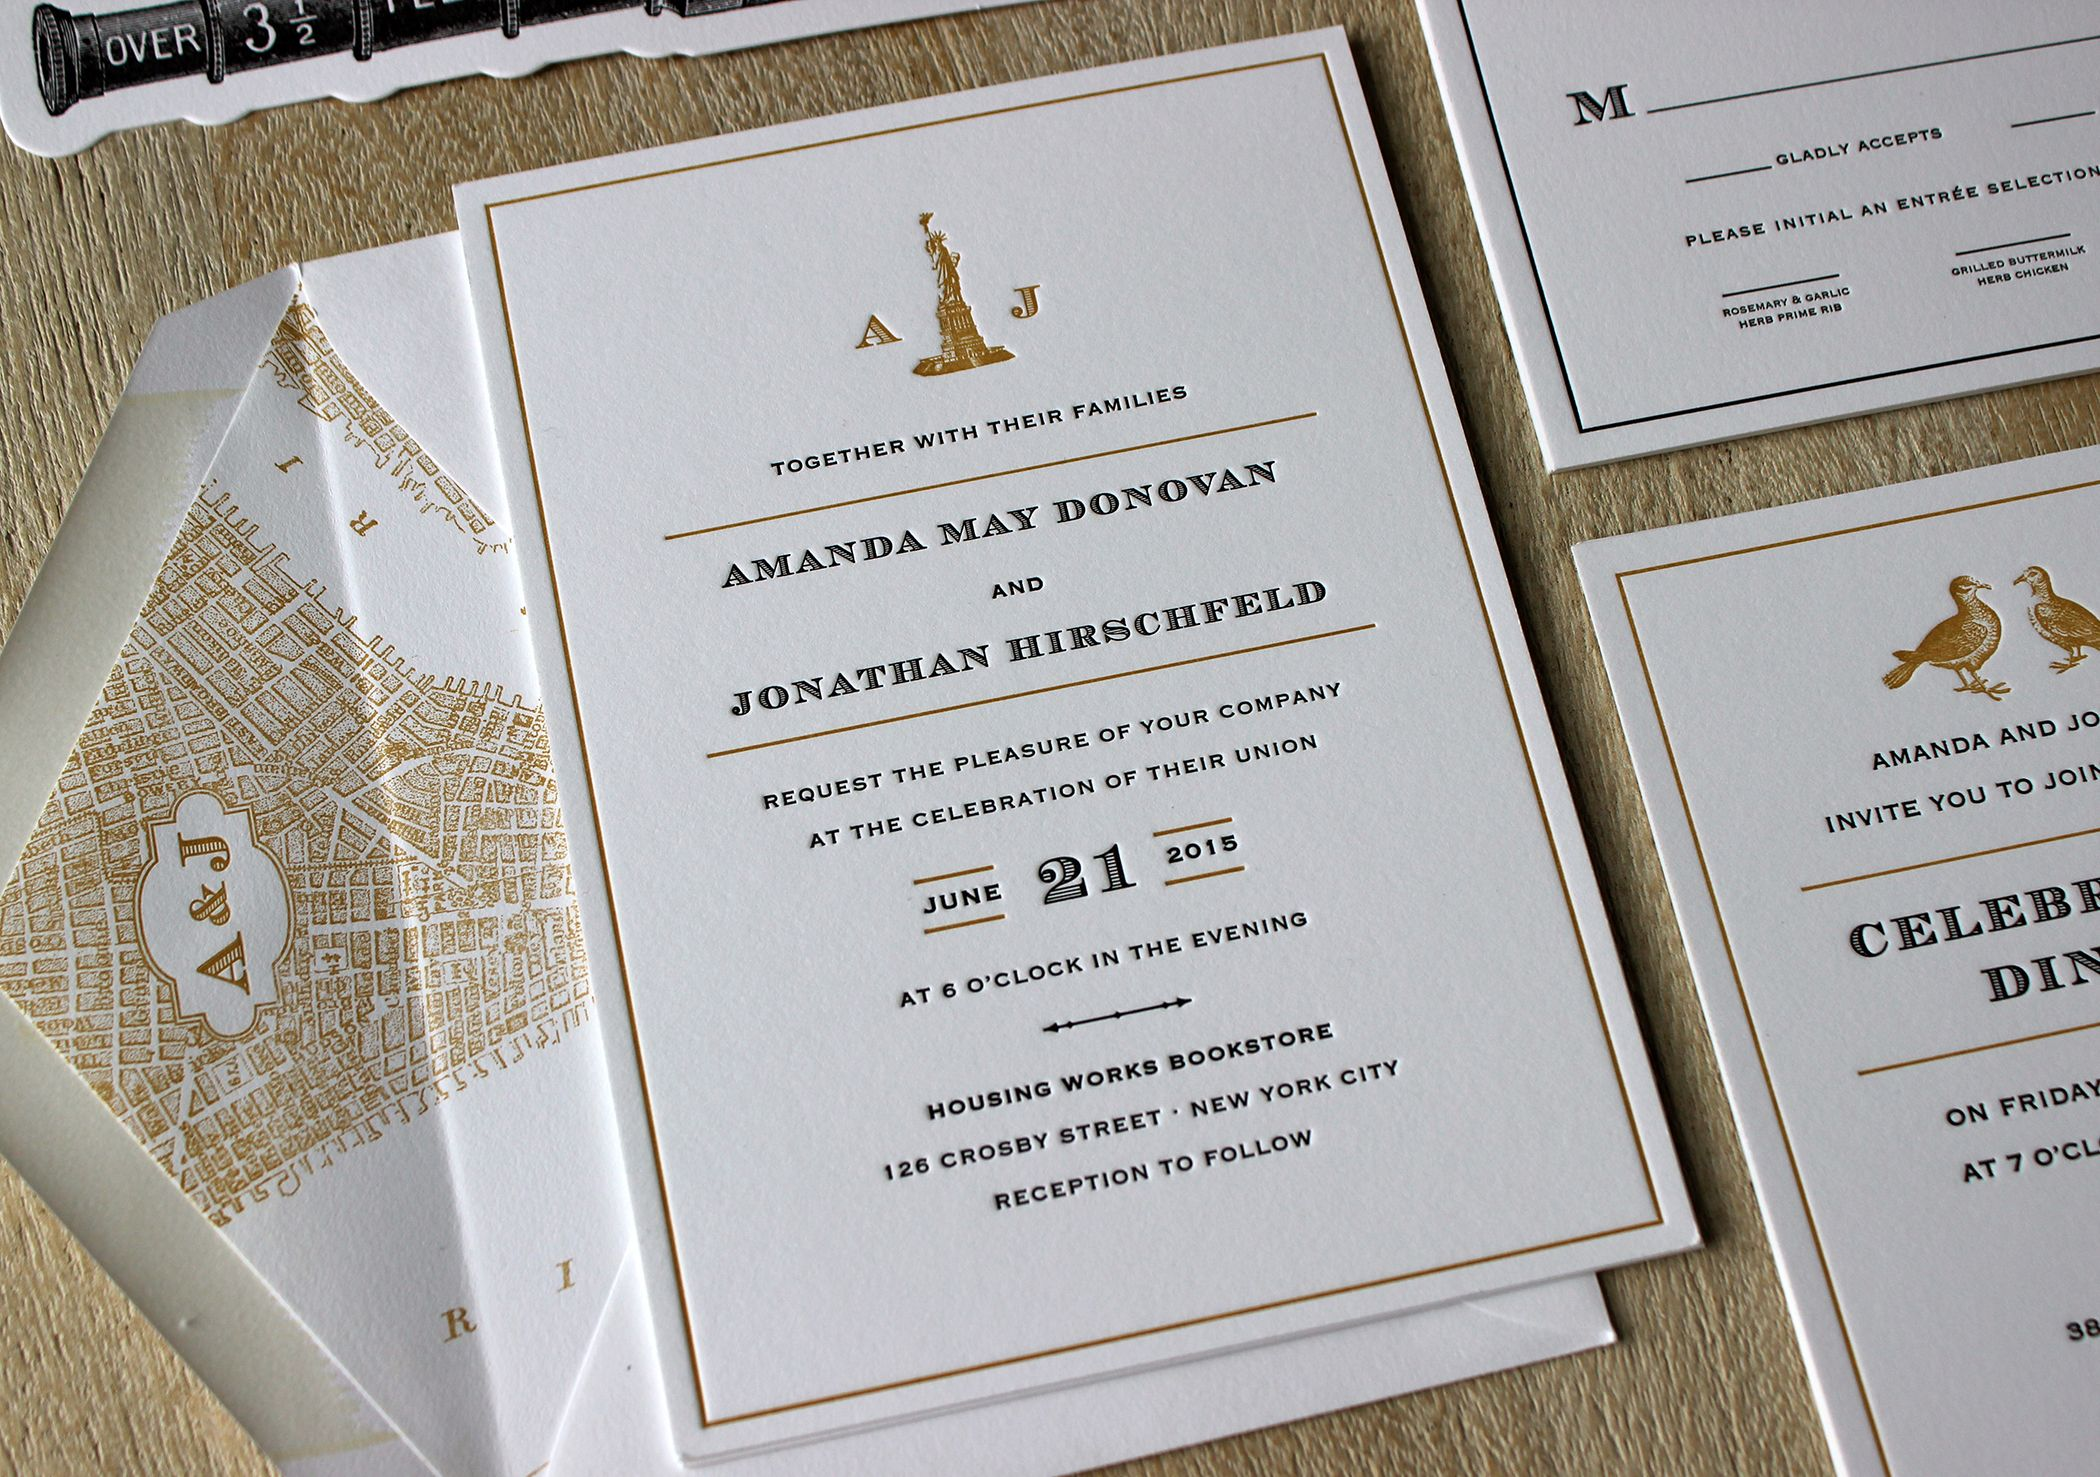 NYC Vintage letterpress wedding invitation by Sesame Letterpress